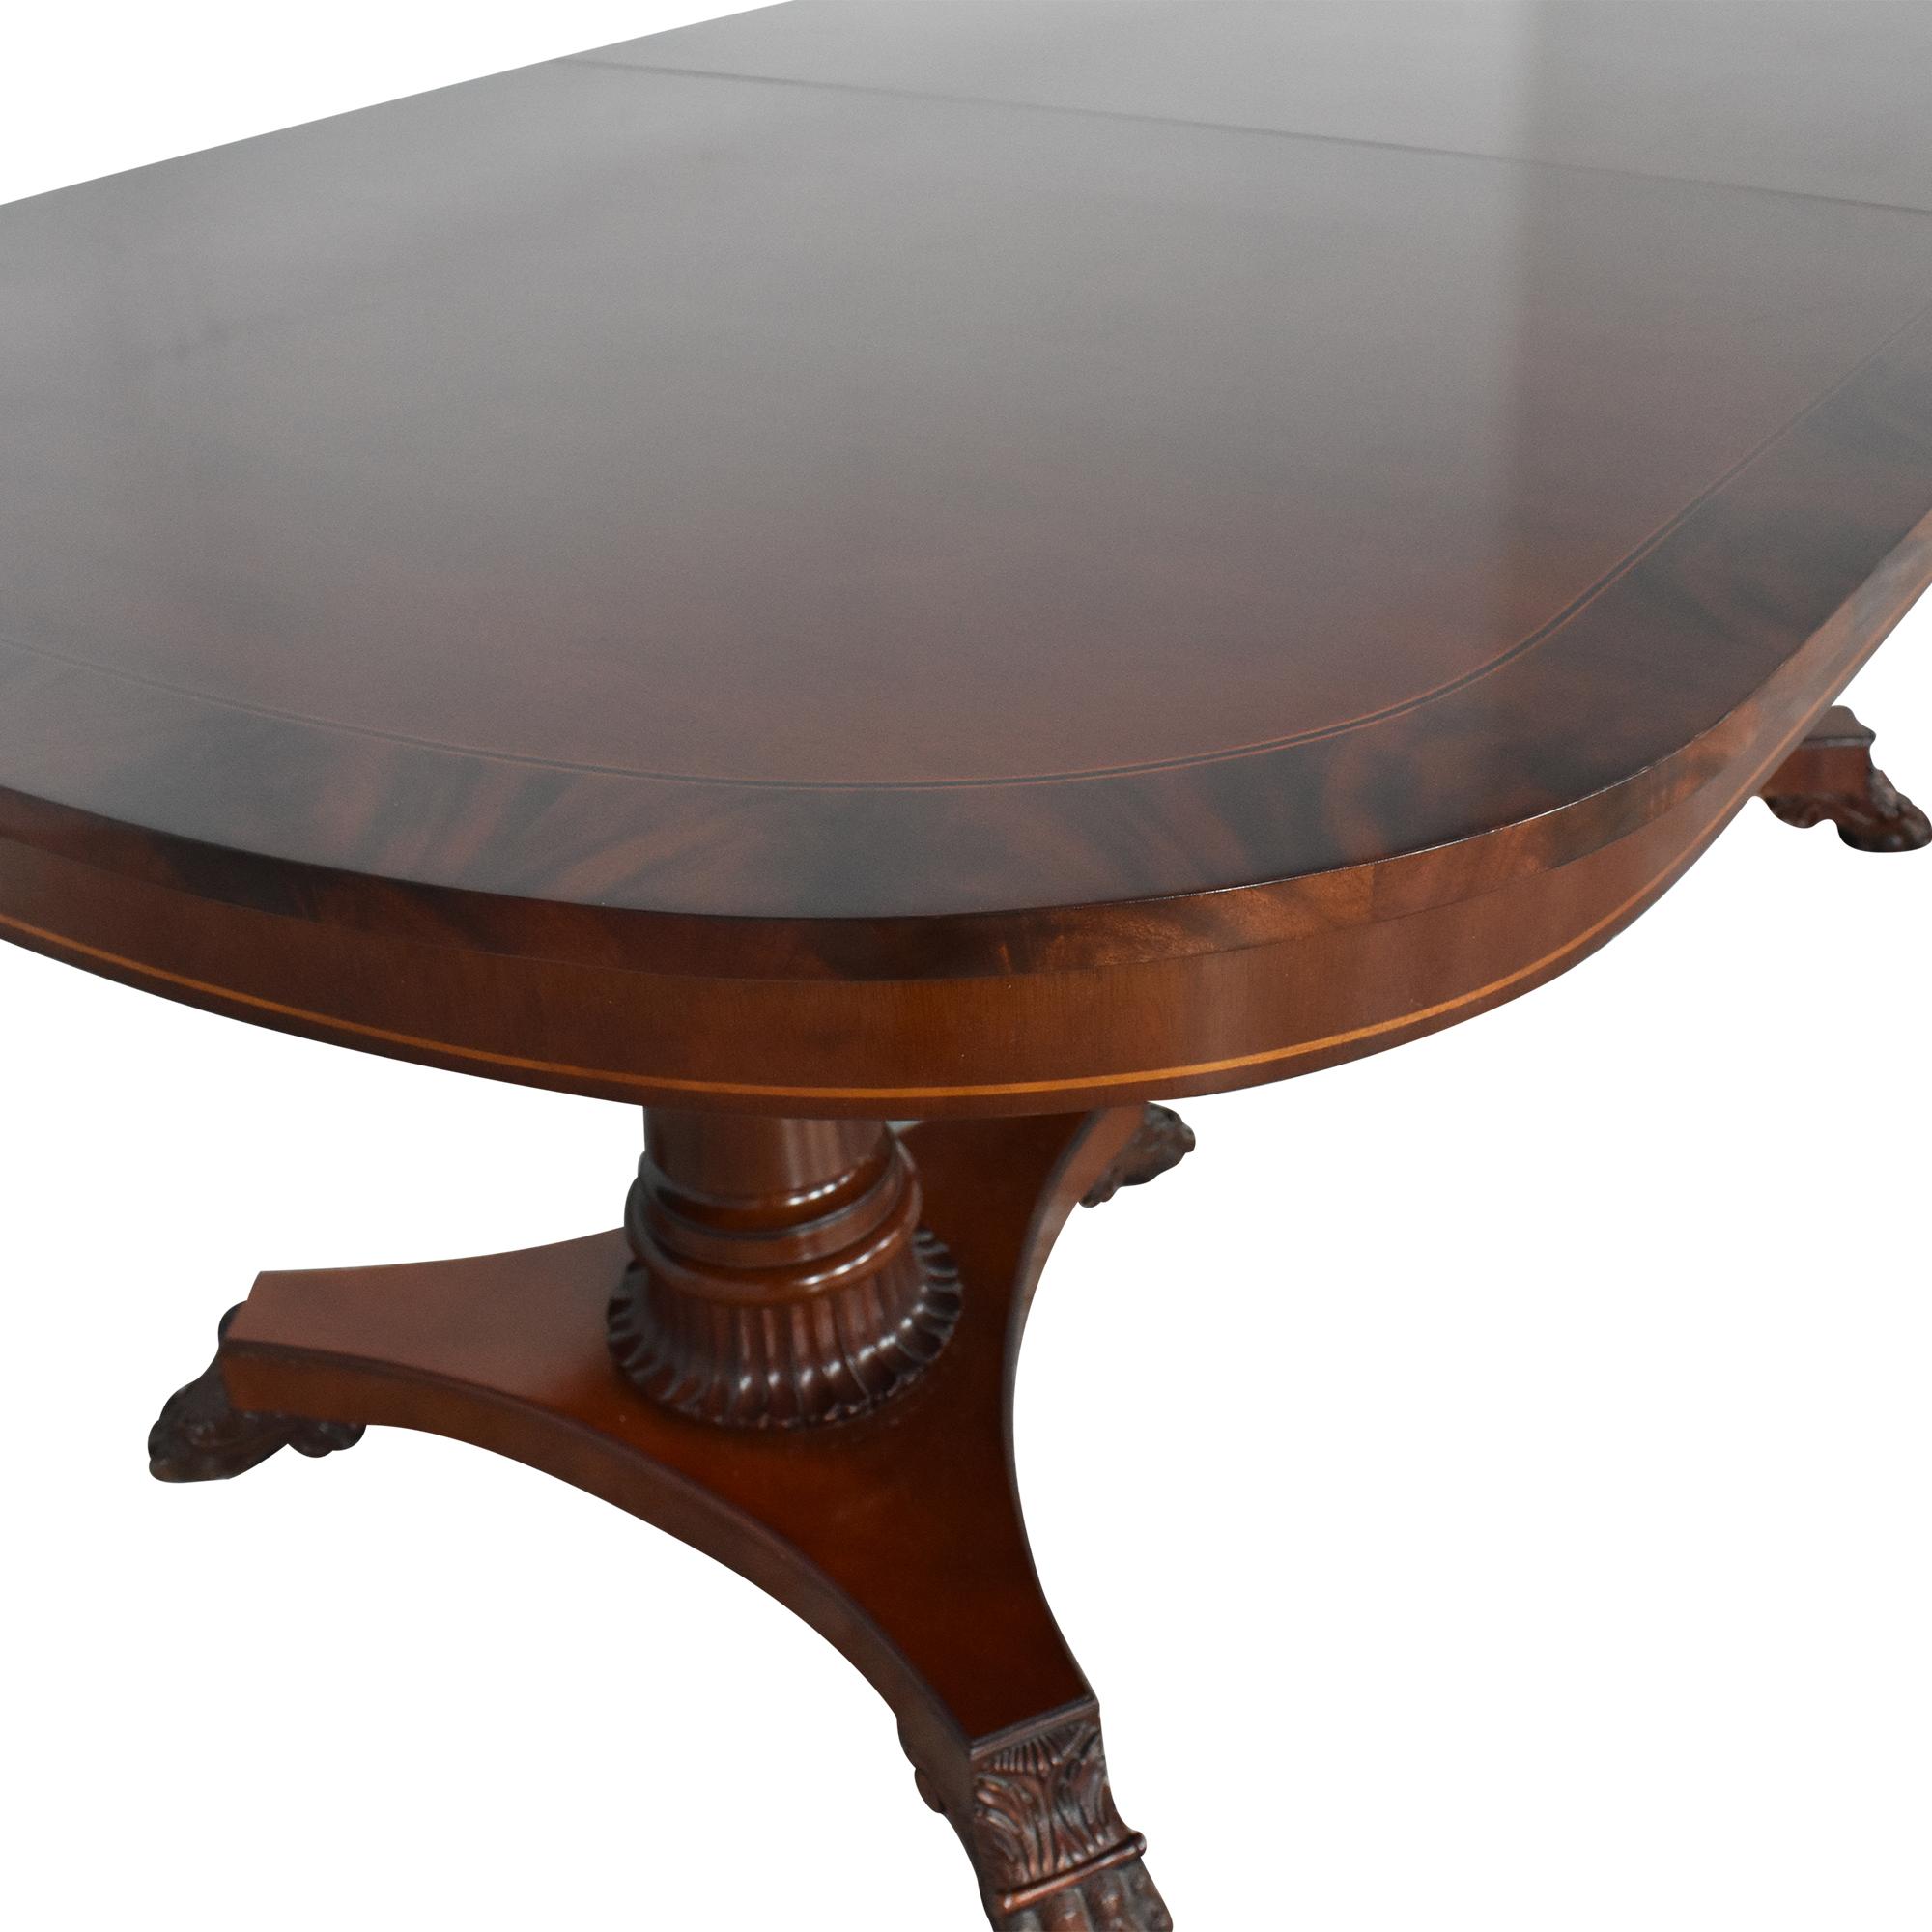 Kindel Kindel Extendable Double Pedestal Dining Table second hand